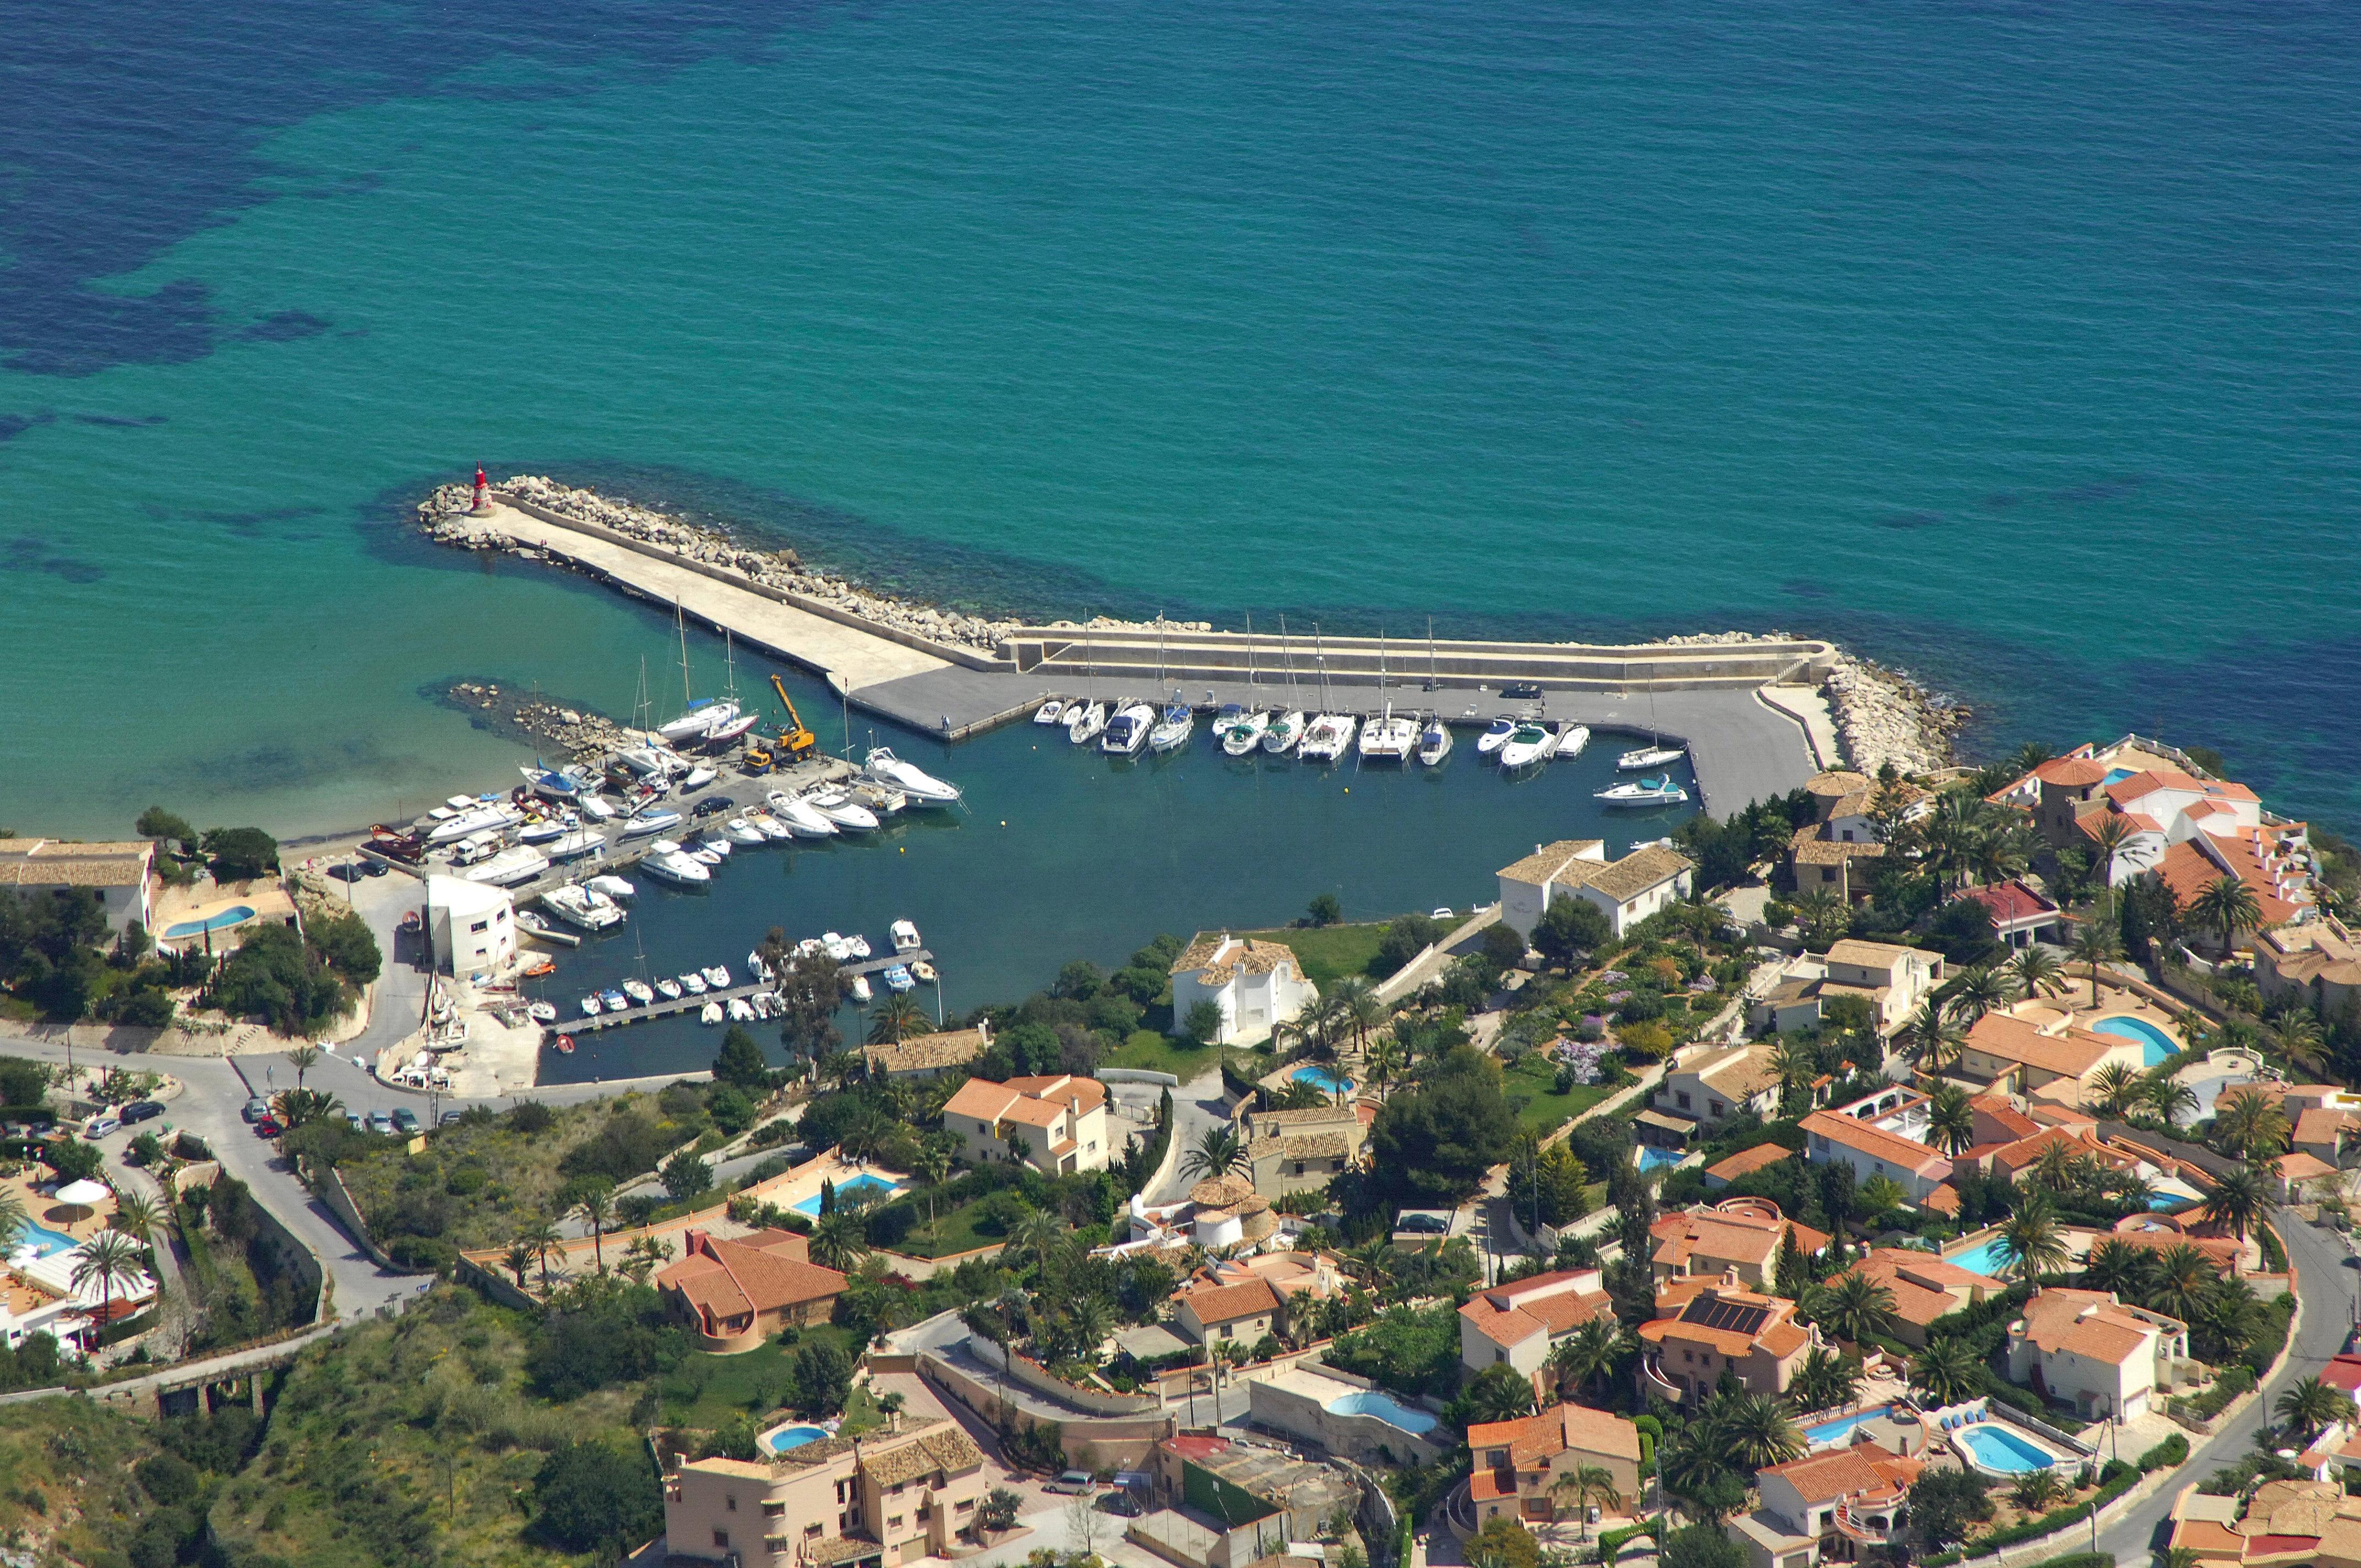 Puerto blanco marina in calpe alicante spain marina reviews phone number - Puerto rico spain weather ...